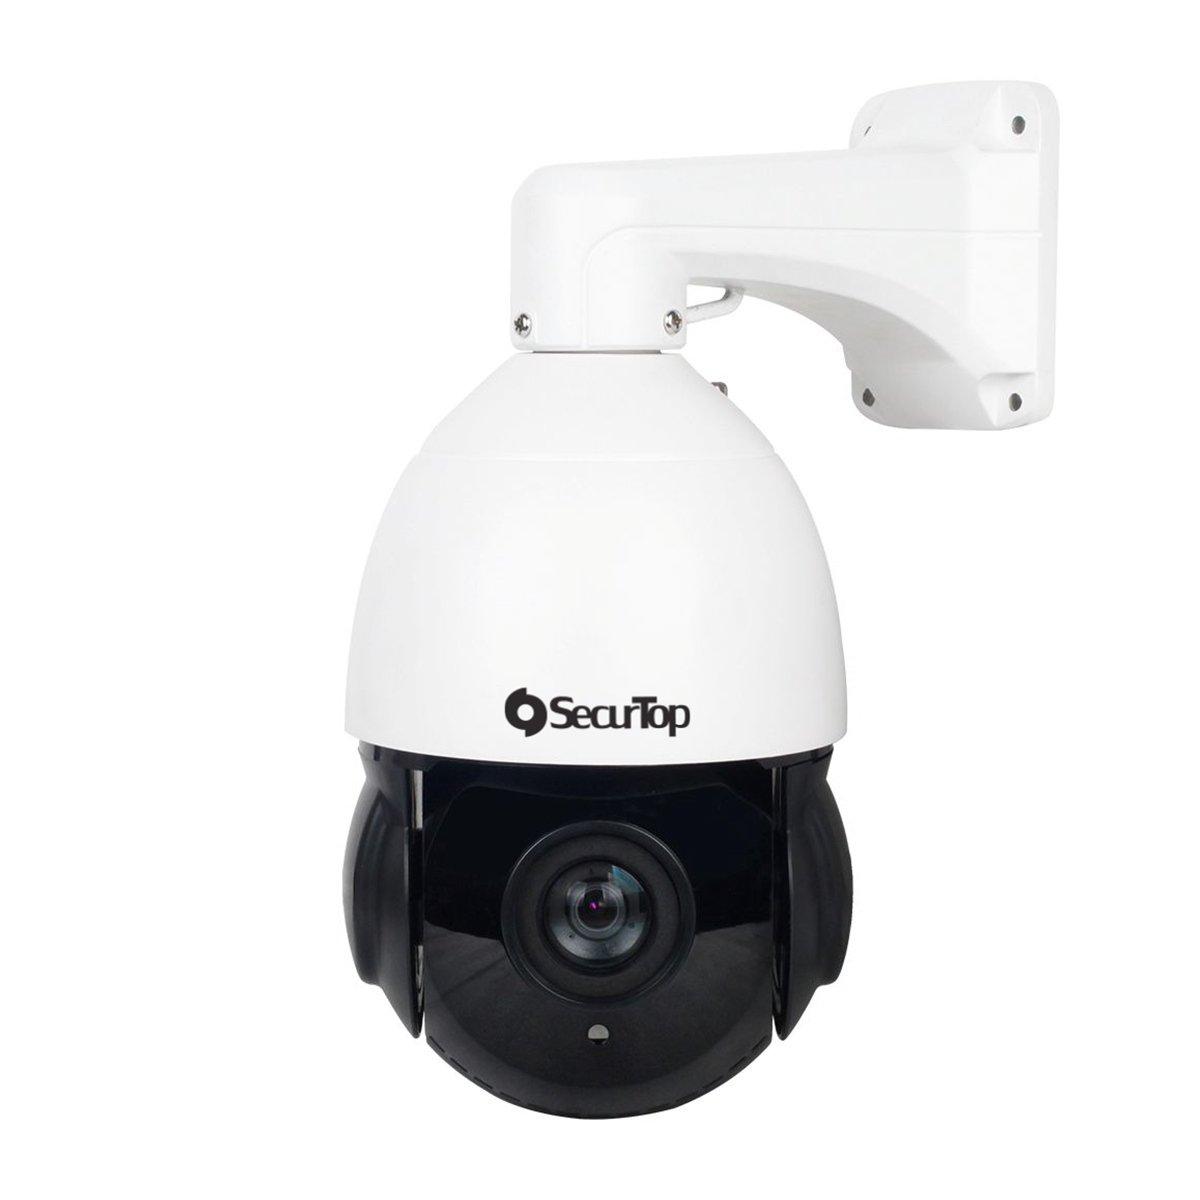 Telecamera PTZ 2 Megapixel con Intelligenza Artificiale - Zoom 5.35-96.3mm (18X)